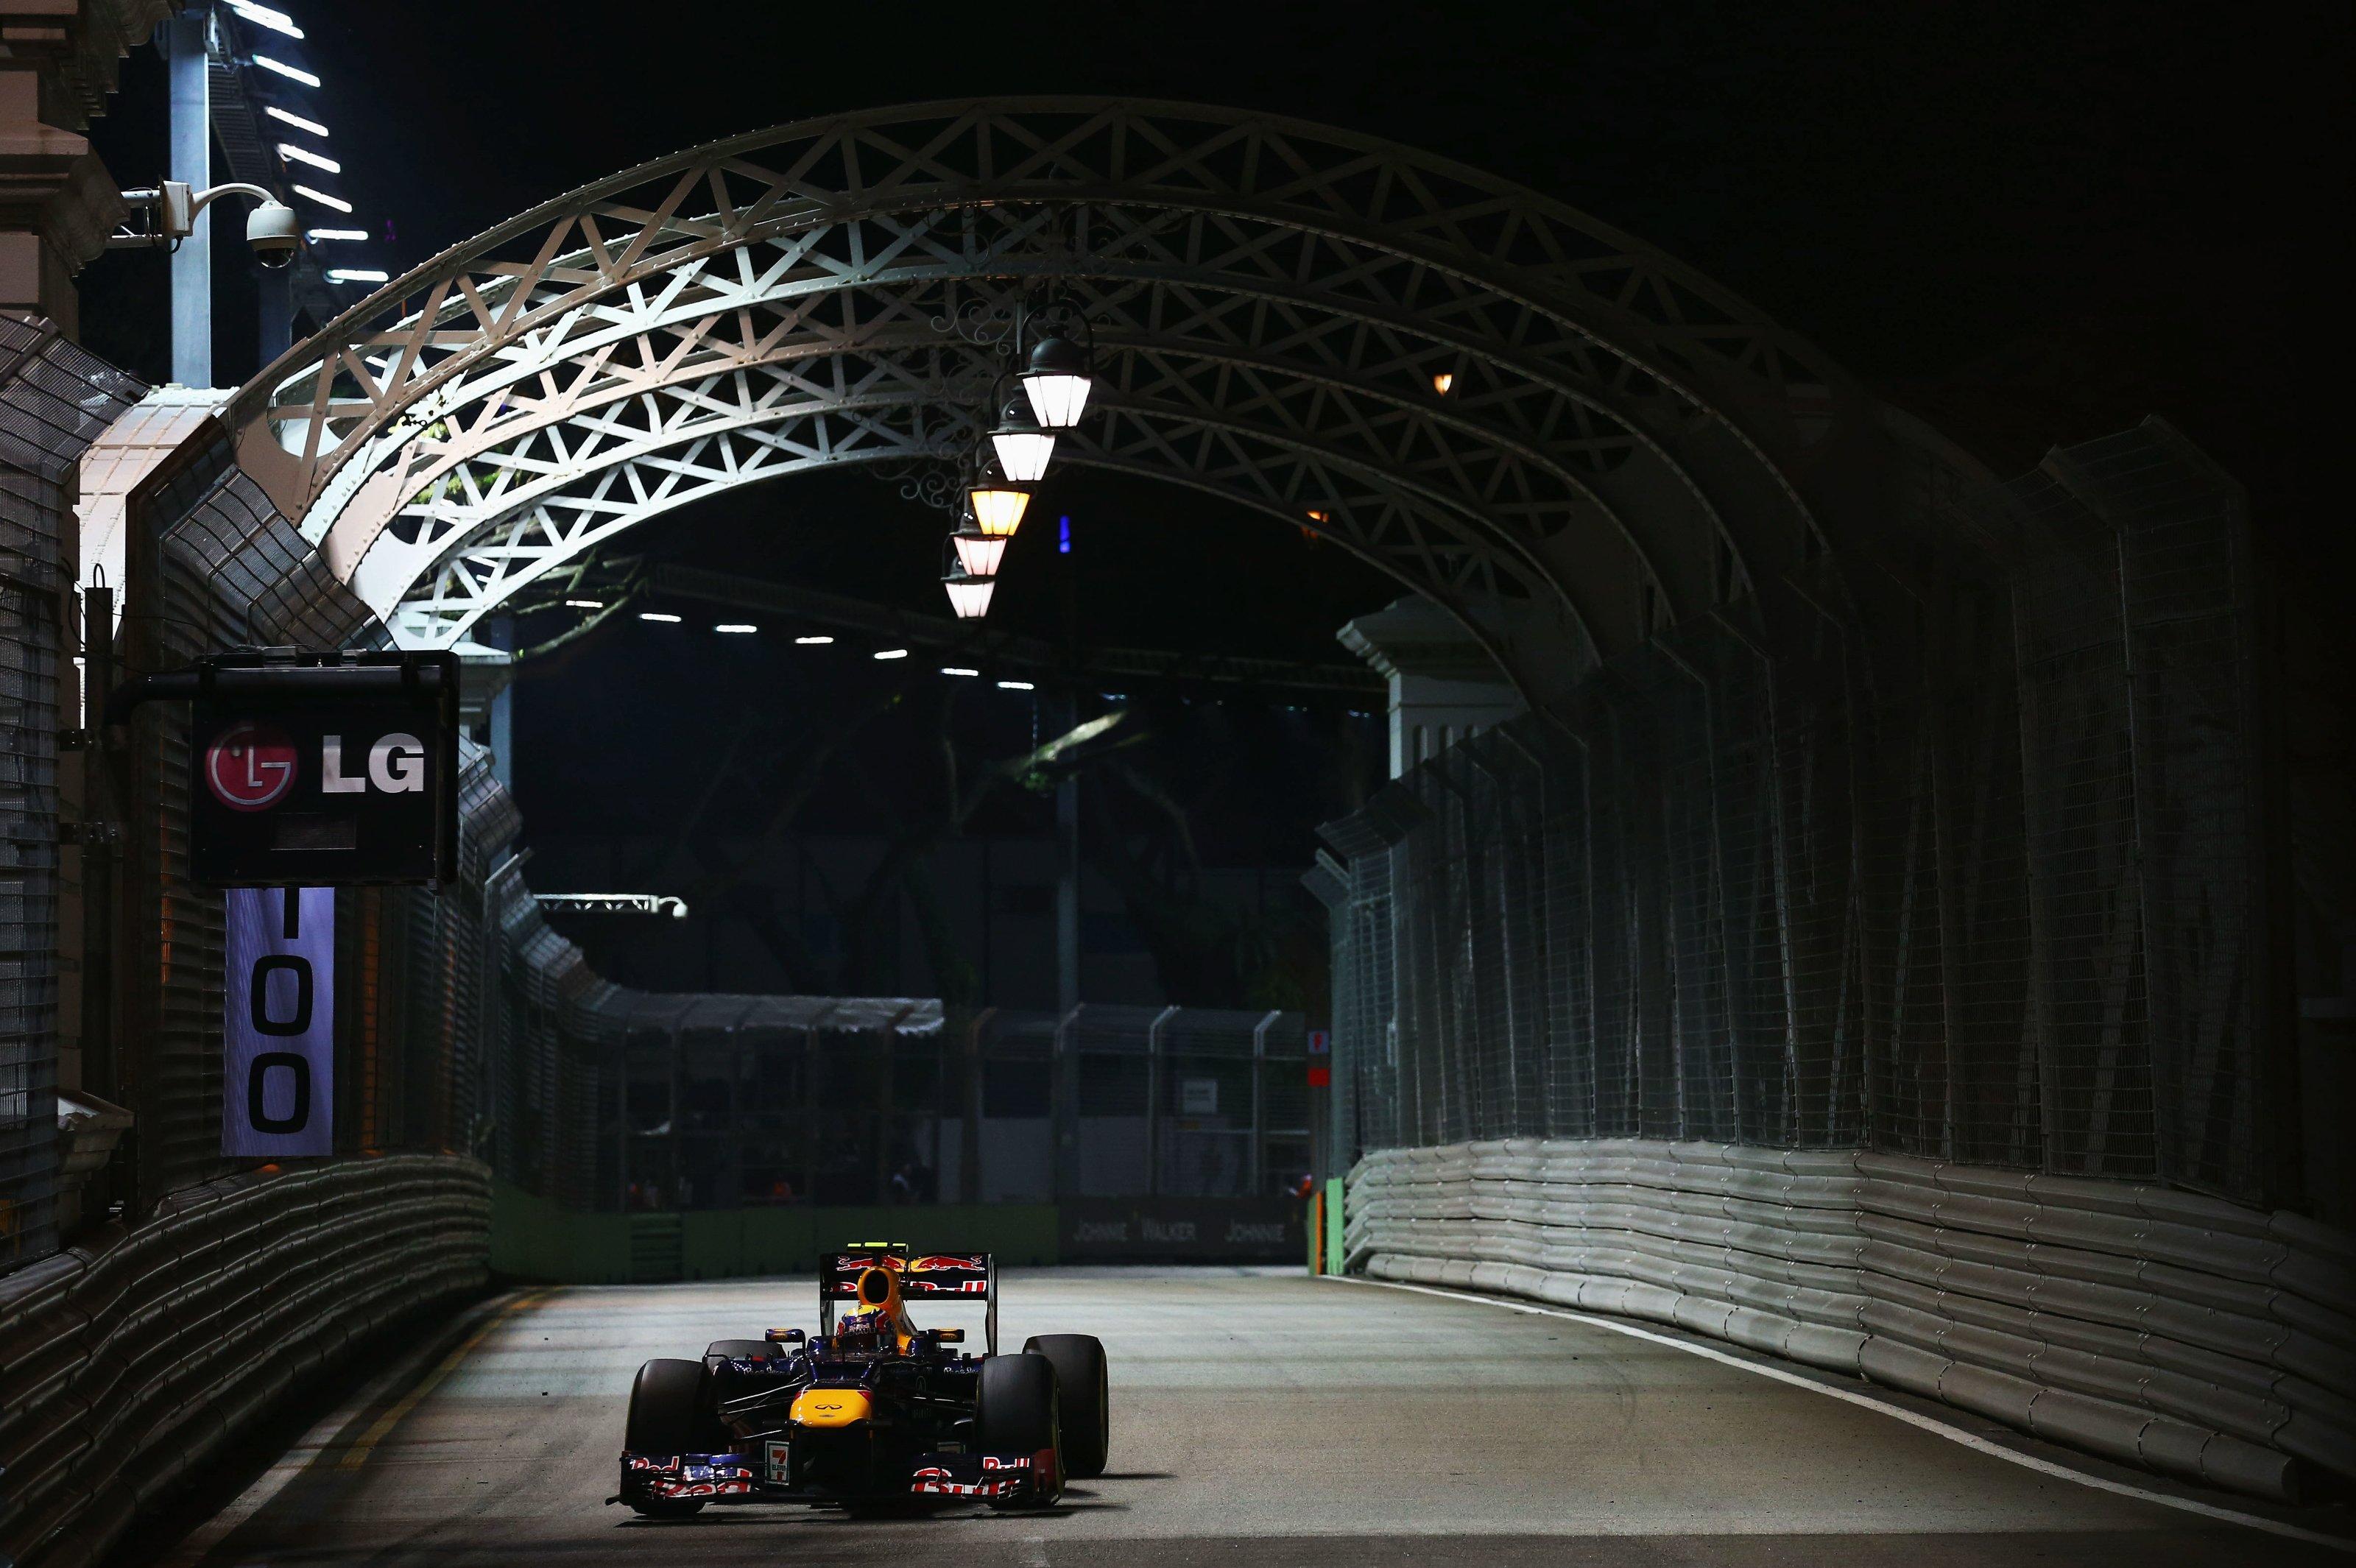 Singapore Grand Prix 2012